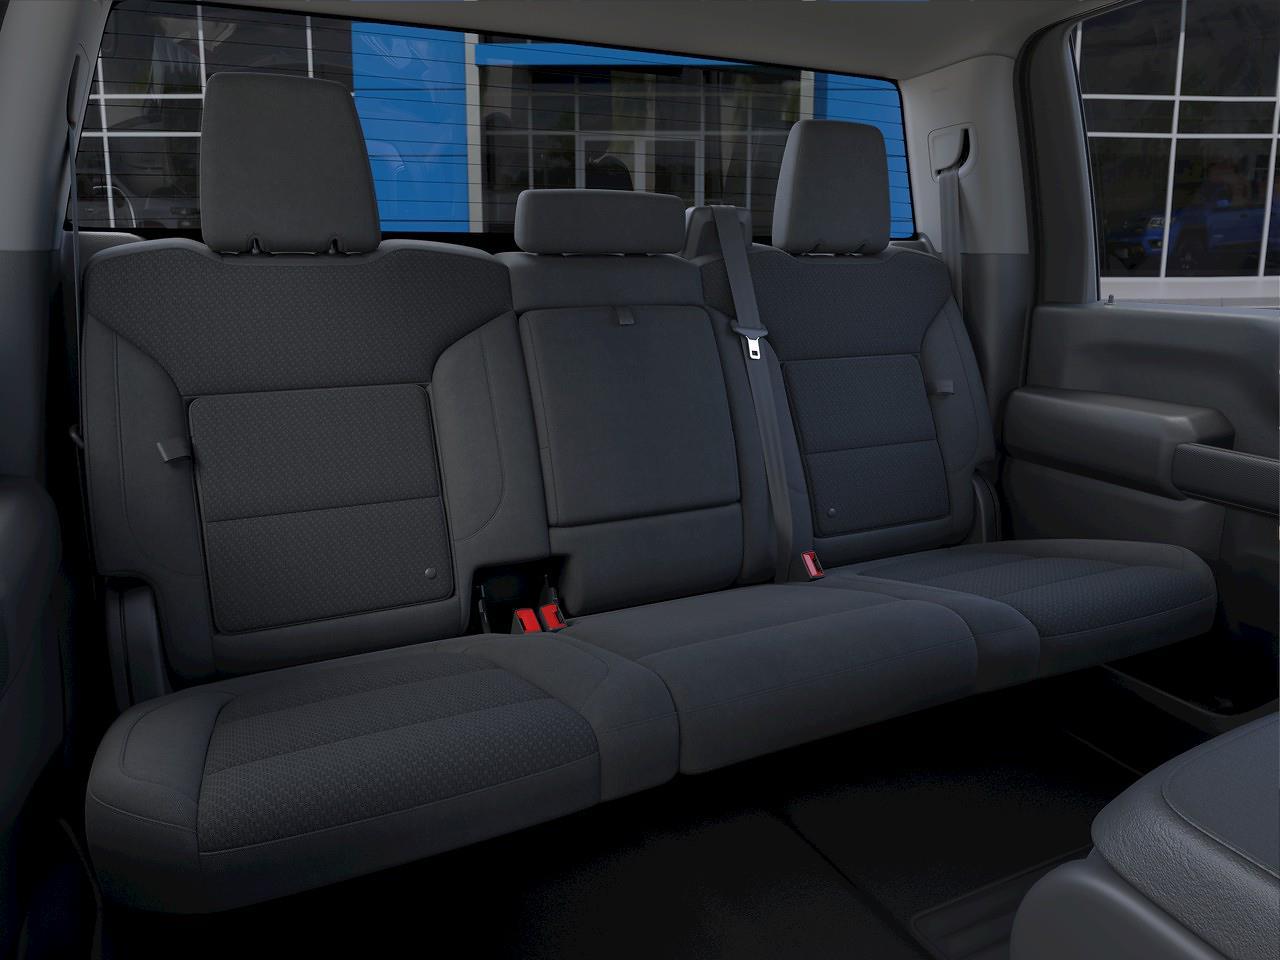 2021 Chevrolet Silverado 2500 Crew Cab 4x4, Pickup #Q210455 - photo 14